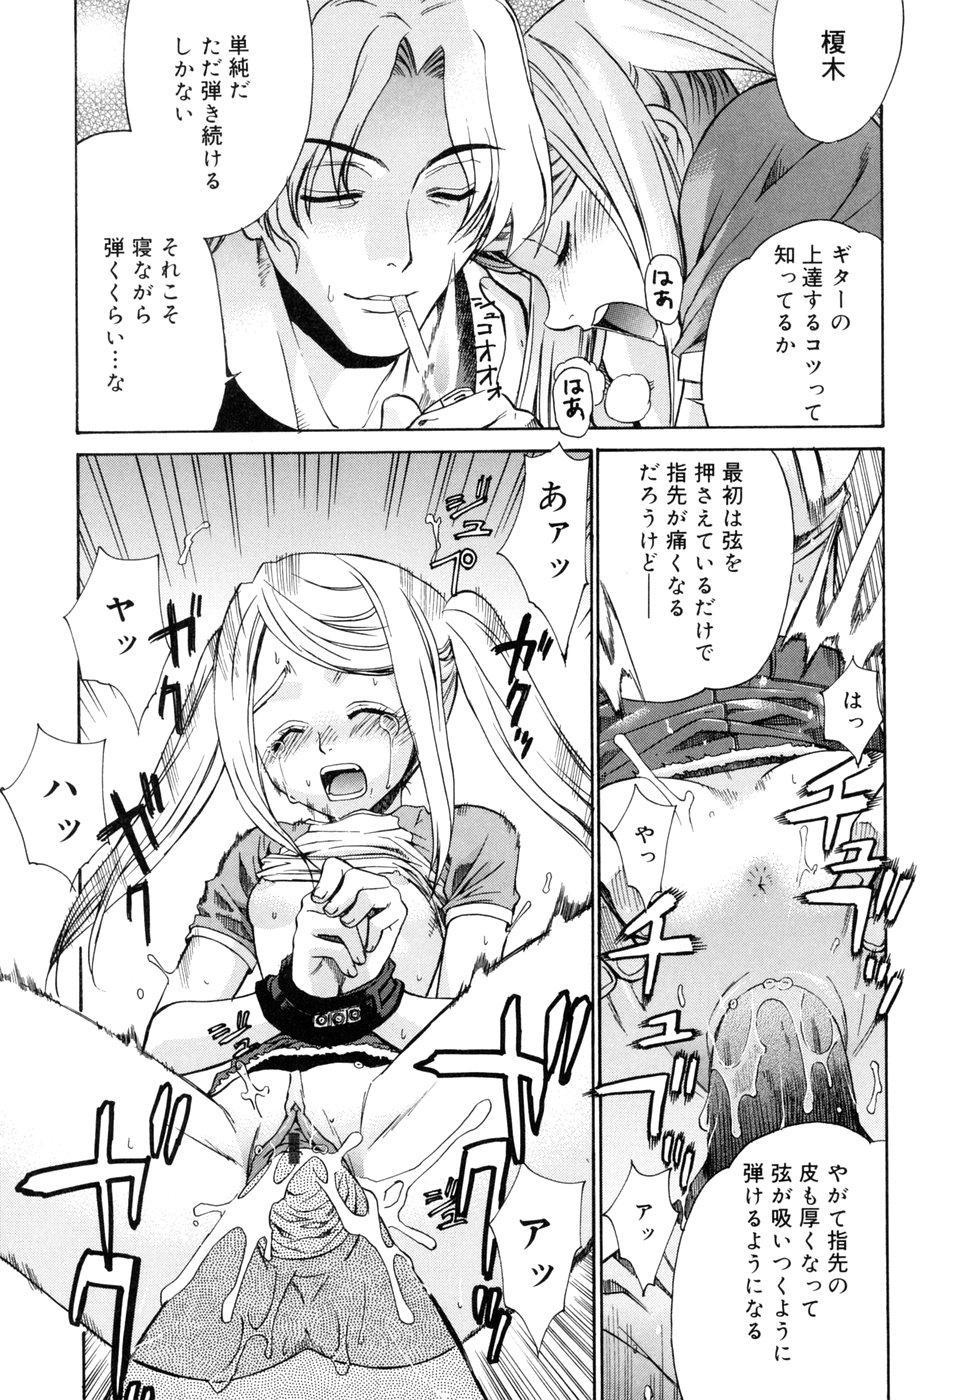 [Yaya Hinata] Tonari no Miko-san wa Minna Warau - The next shrine maidens smile in everyone. 190